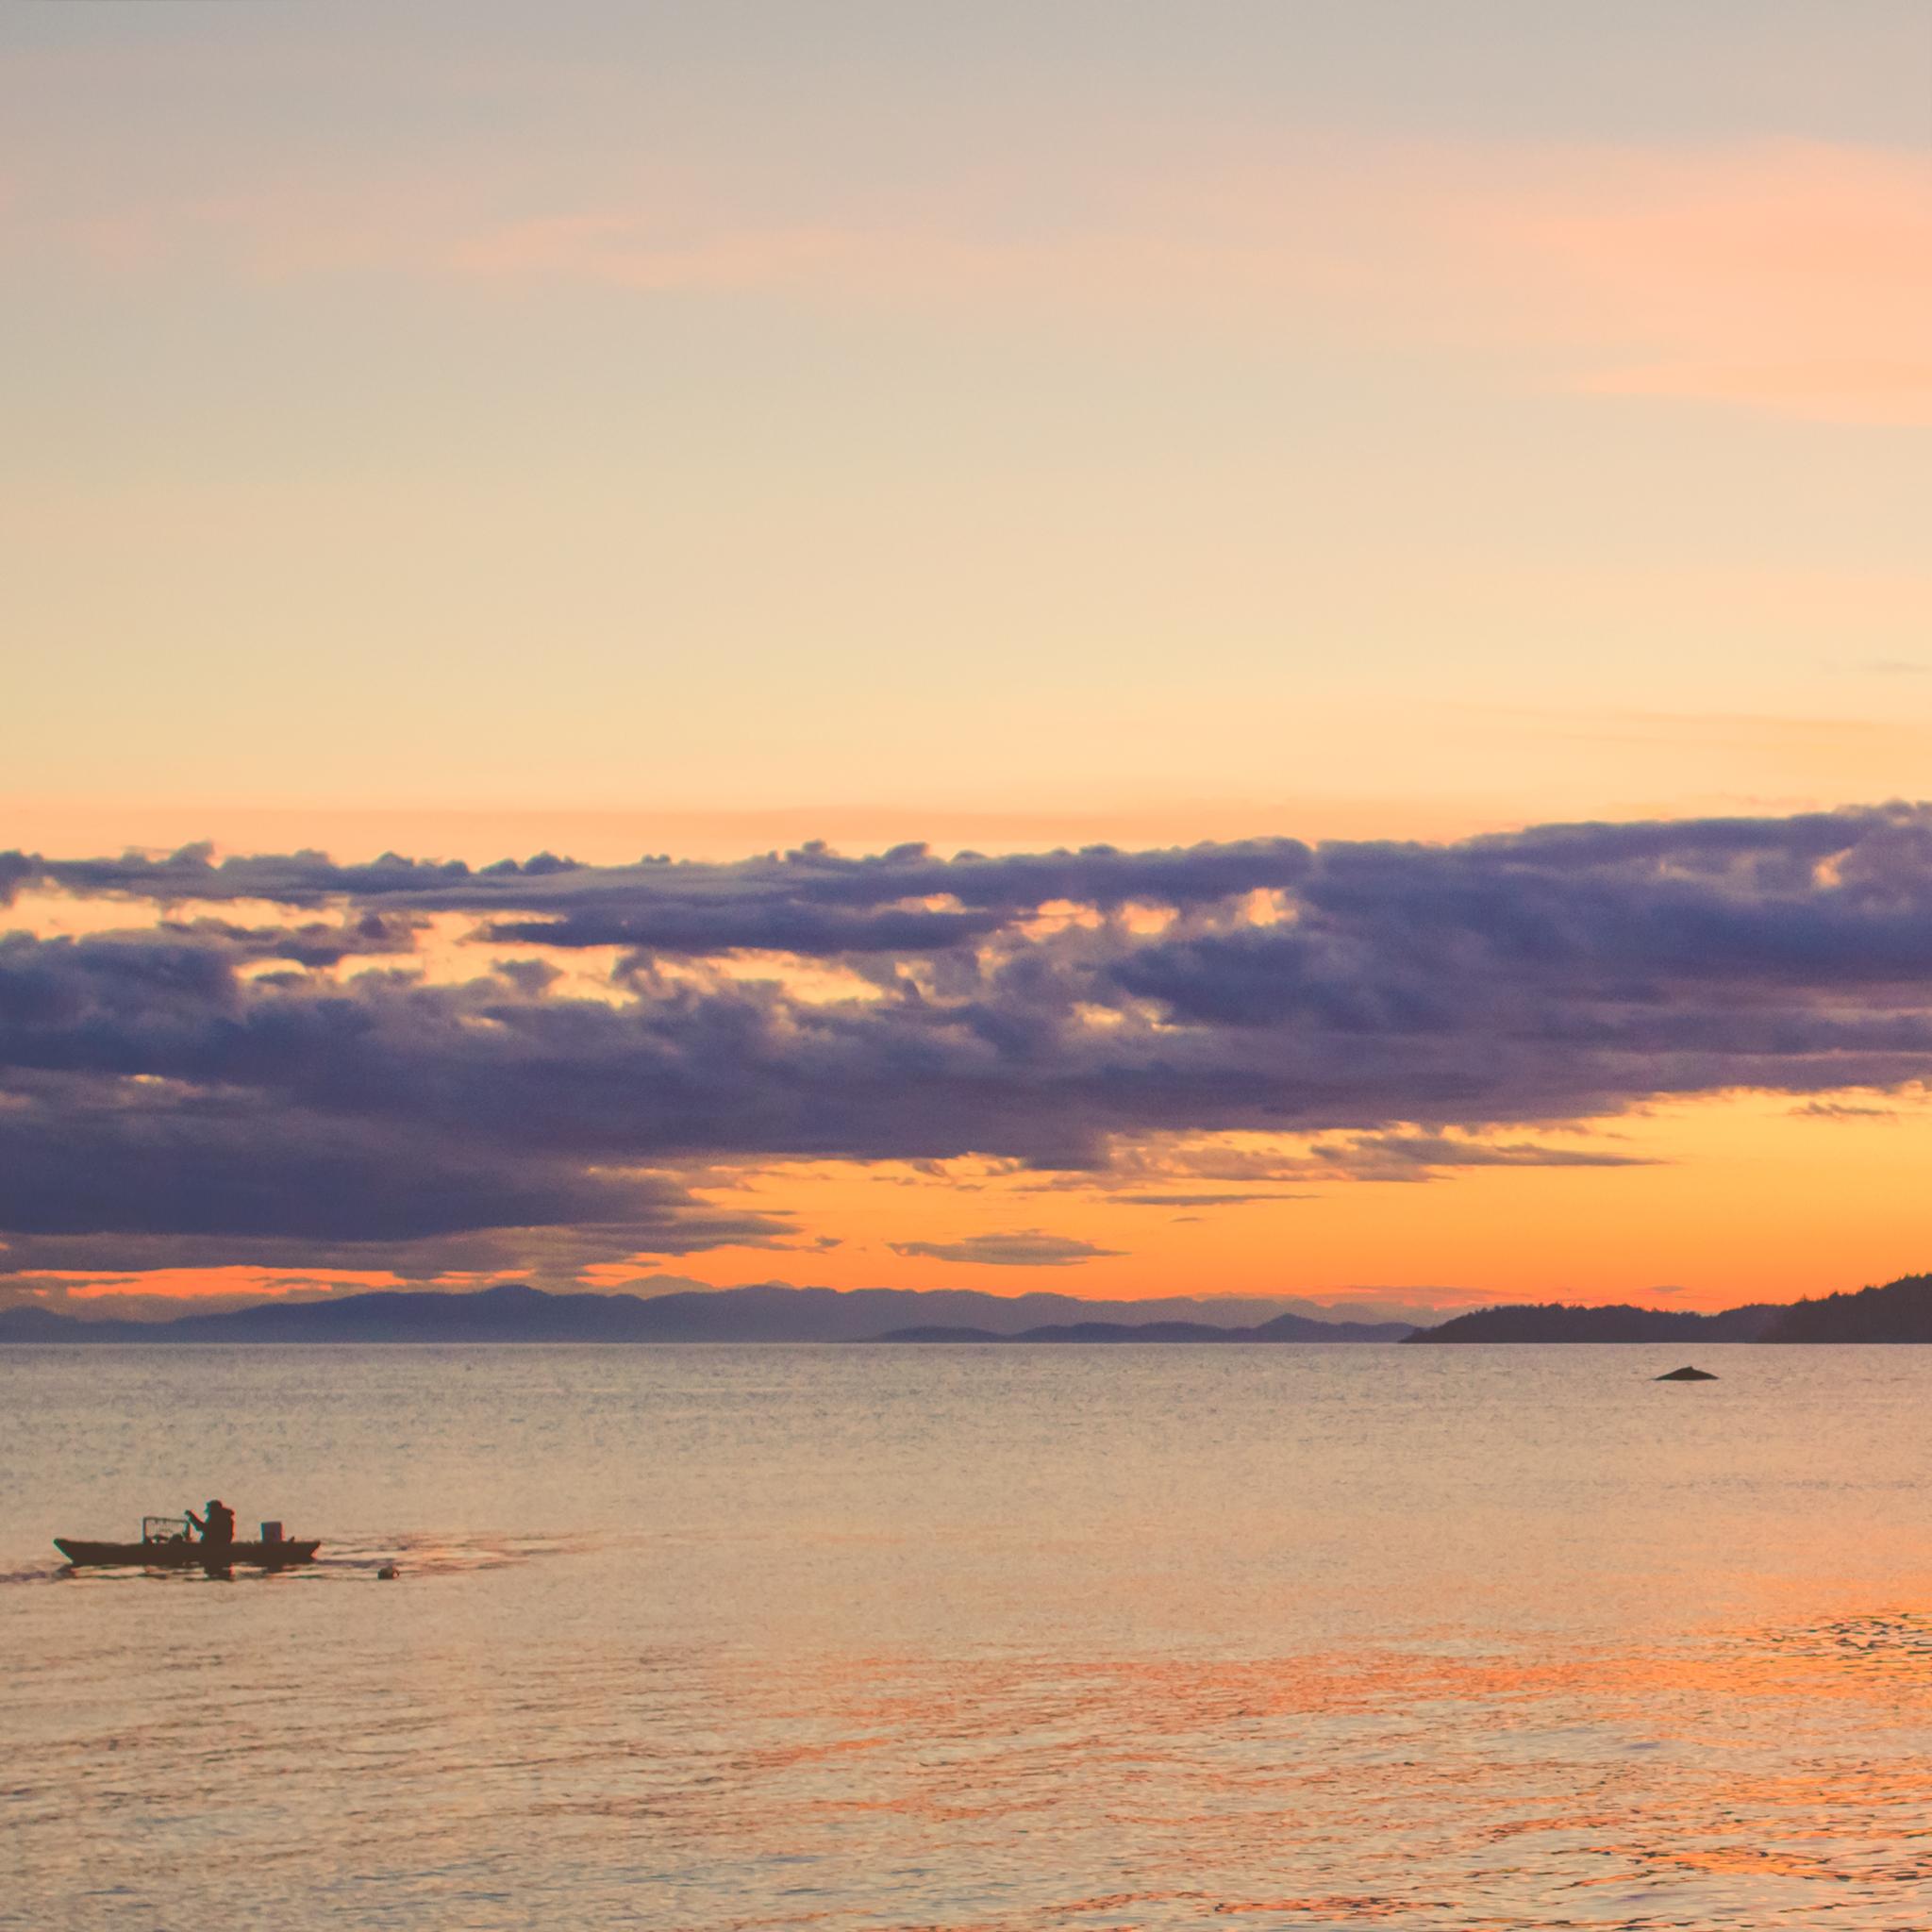 humpback whales, davis bay pier, sunshine coast bc, jennifer picard photography